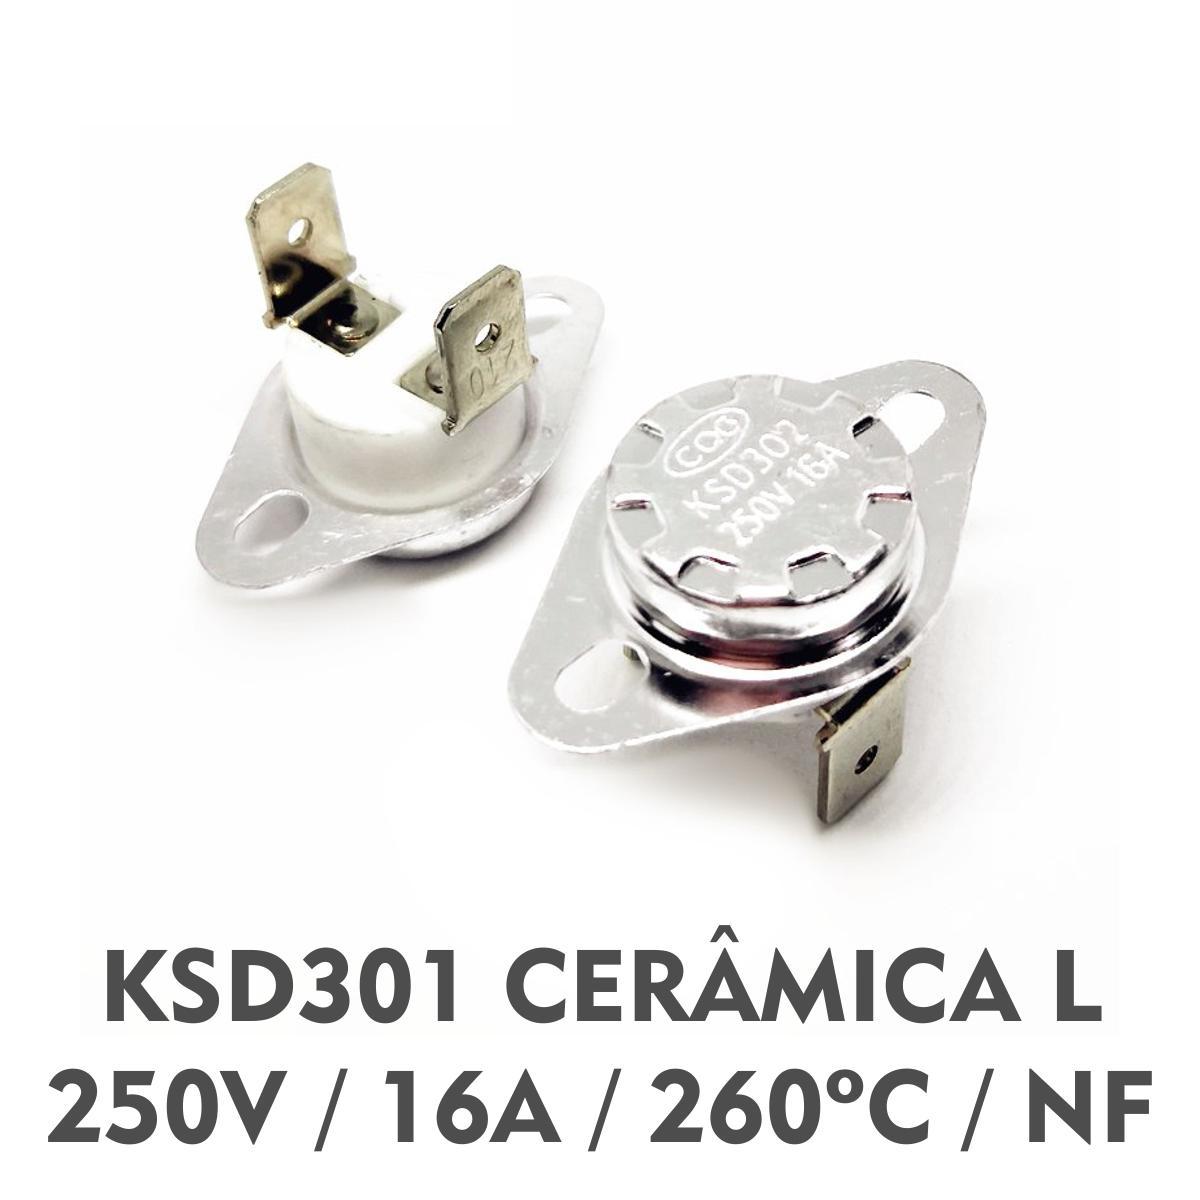 TERMOSTATO KSD301 KSD302 250V 16A - CERÂMICA 140ºC - NORMAL: FECHADO